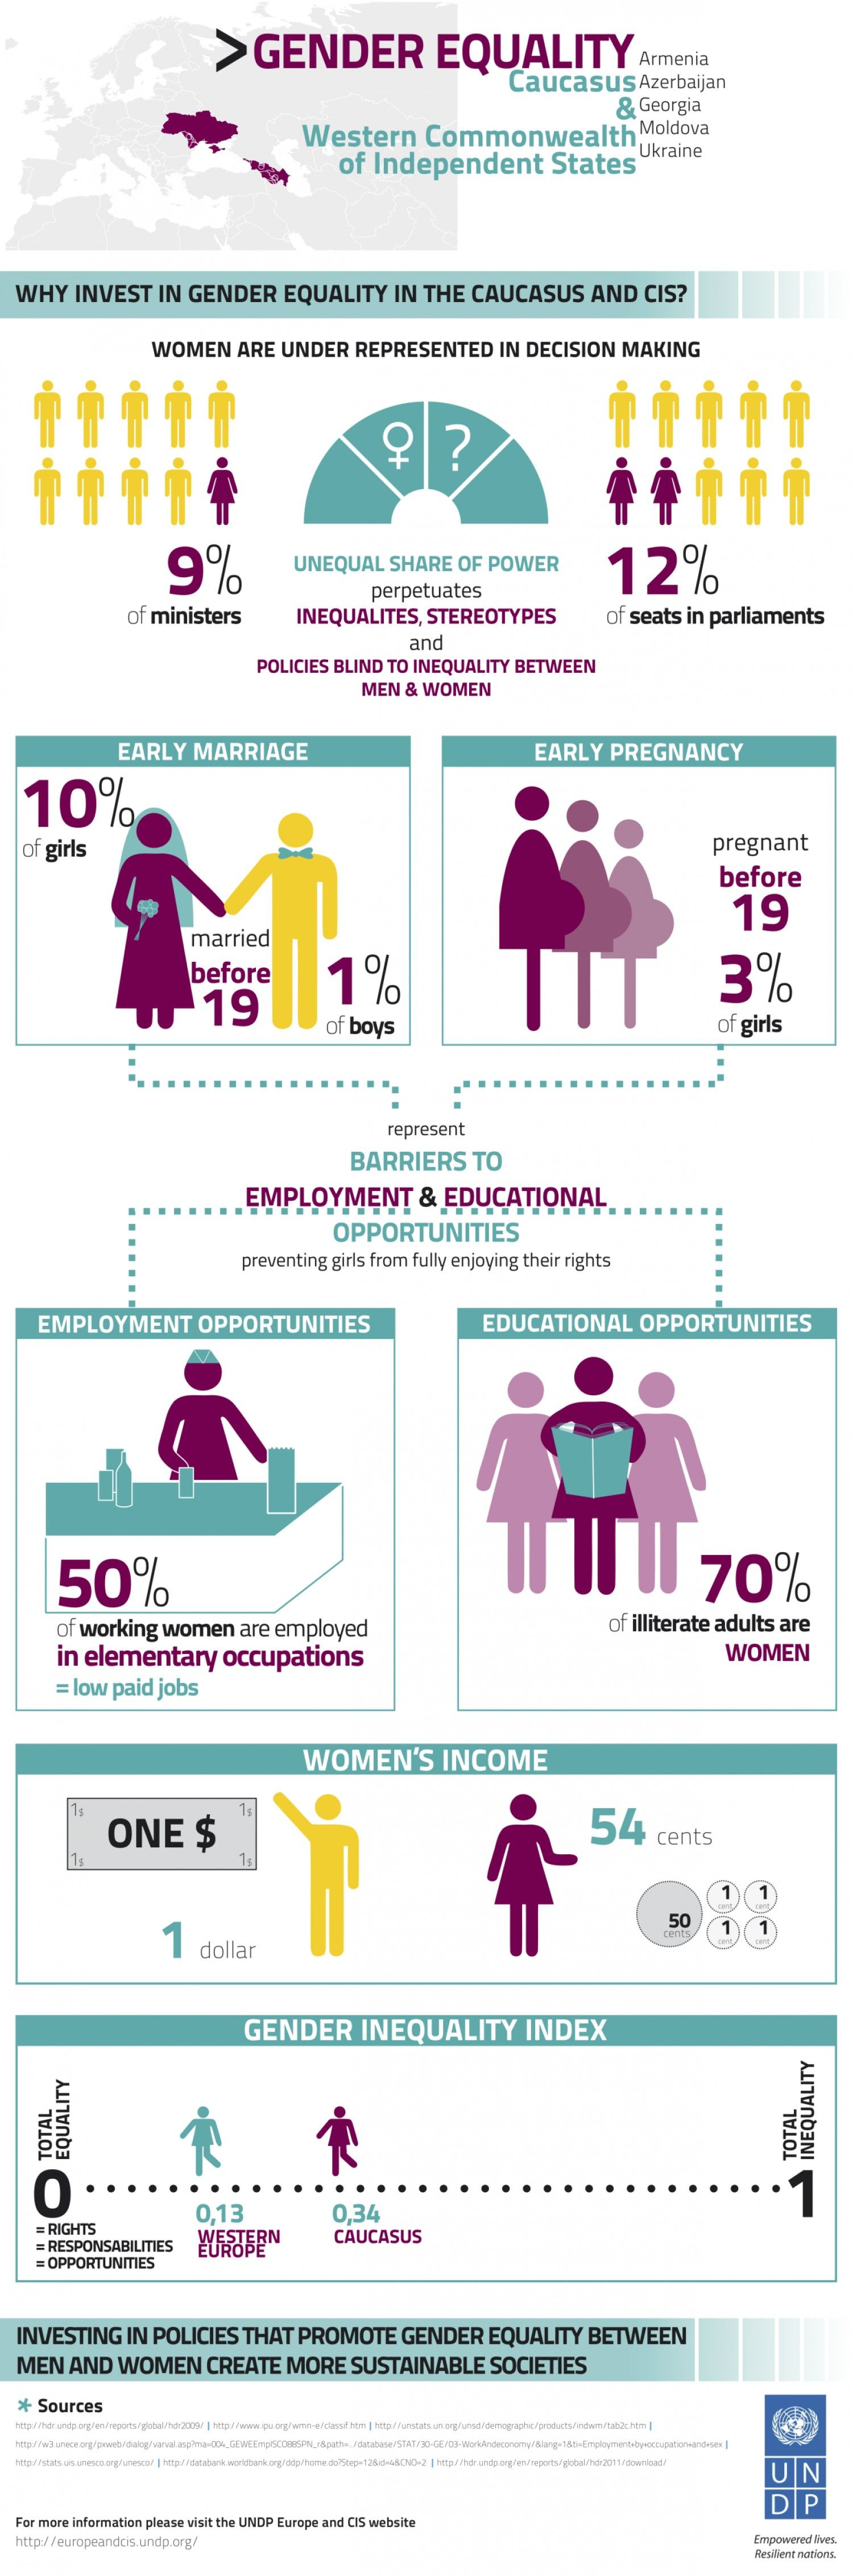 Gender Equality Caucasus  Western Cis Infographic  Feminist  Gender Equality Caucasus  Western Cis Infographic